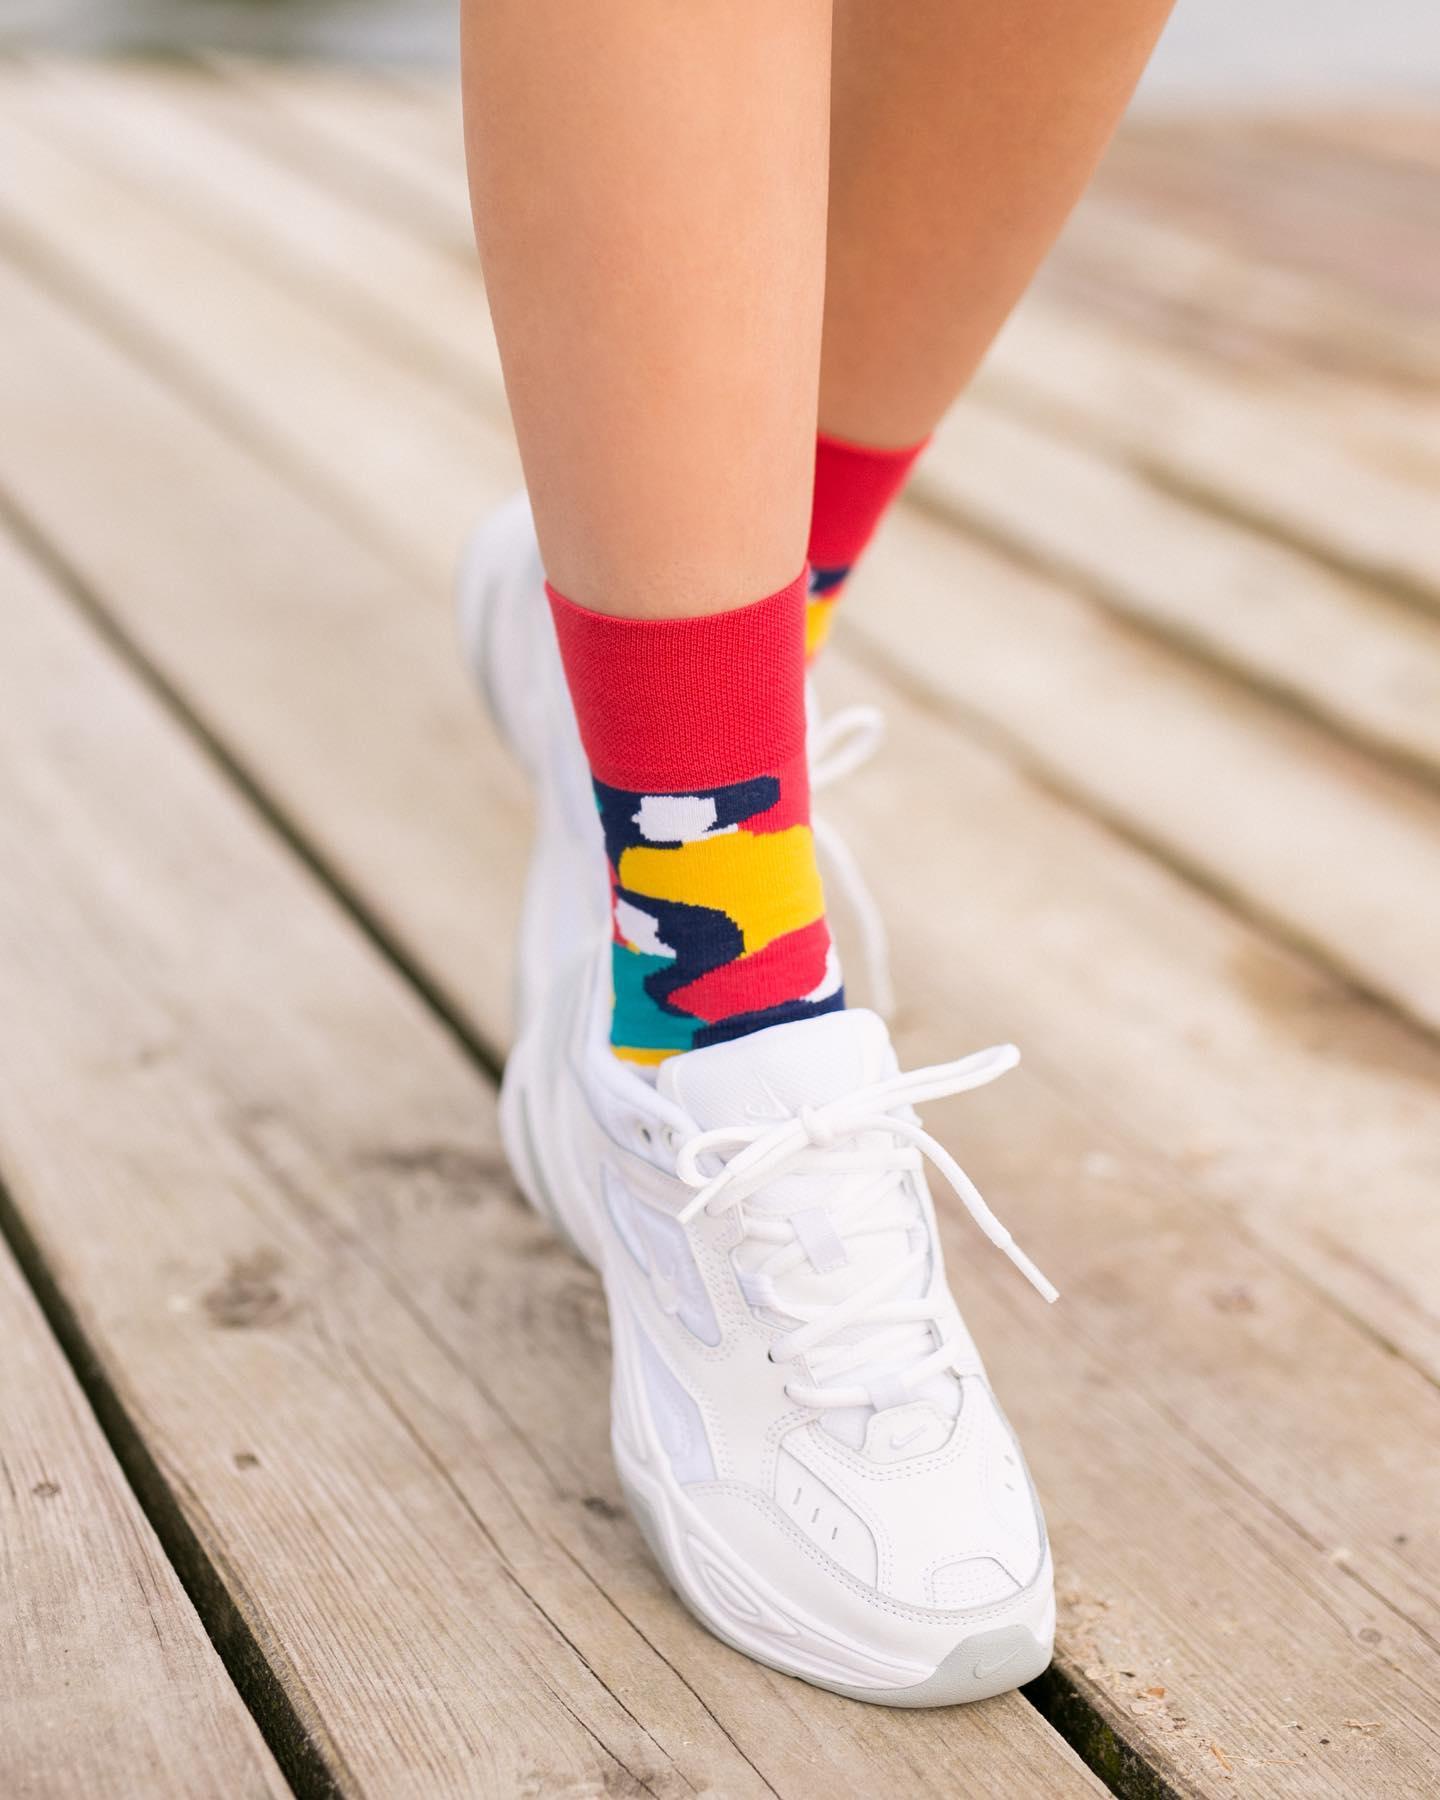 Dokąd dziś zmierzasz? 🙃 . . . . #hello #morning #walk #summer #wakacje #summervibes #lato #skarpetki #moresocks #skarpetkimore #shoes #ilovesocks #legs #jezioro #details #dodatki #girl #instagirl